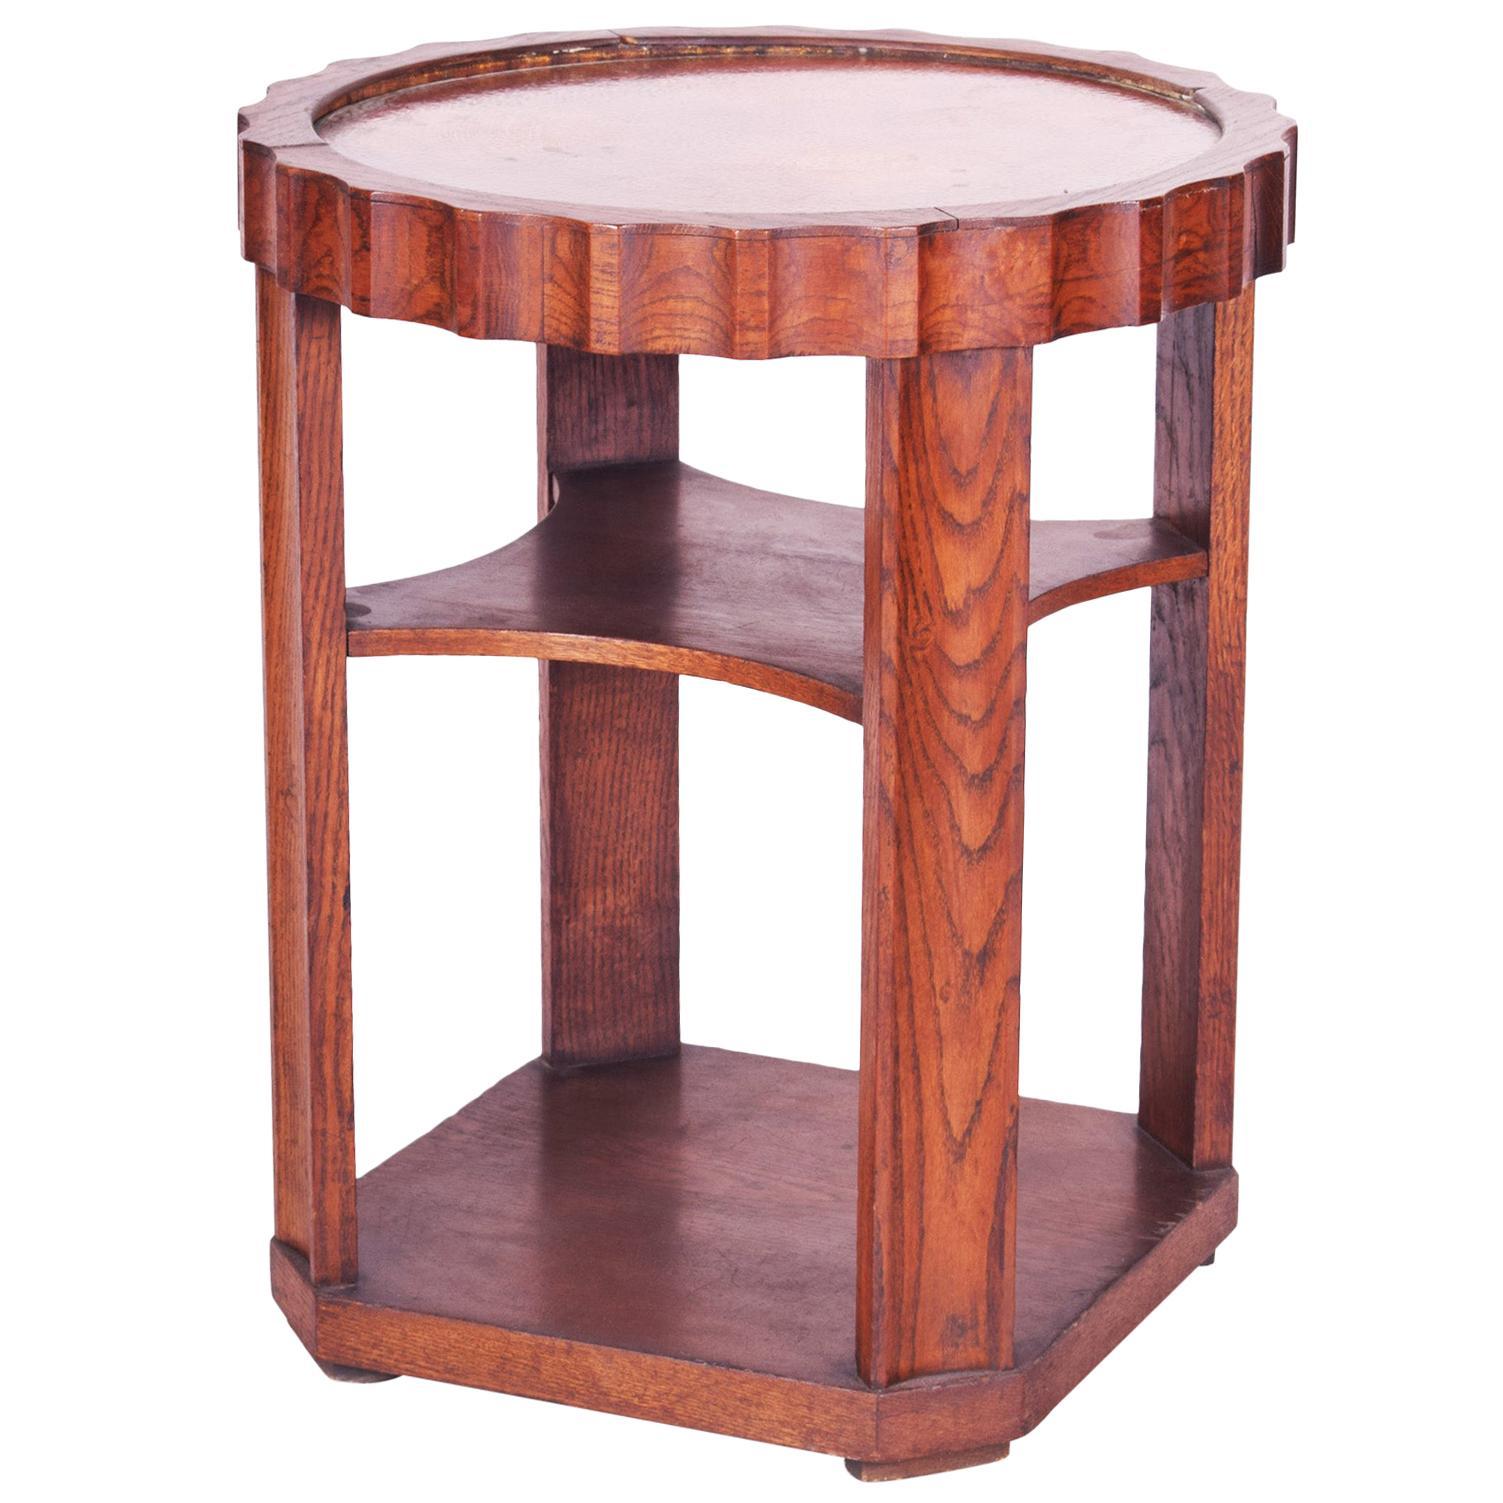 Small Czech Oak Art Deco Round Table, Copper Plate Desk, Good Condition, 1920s